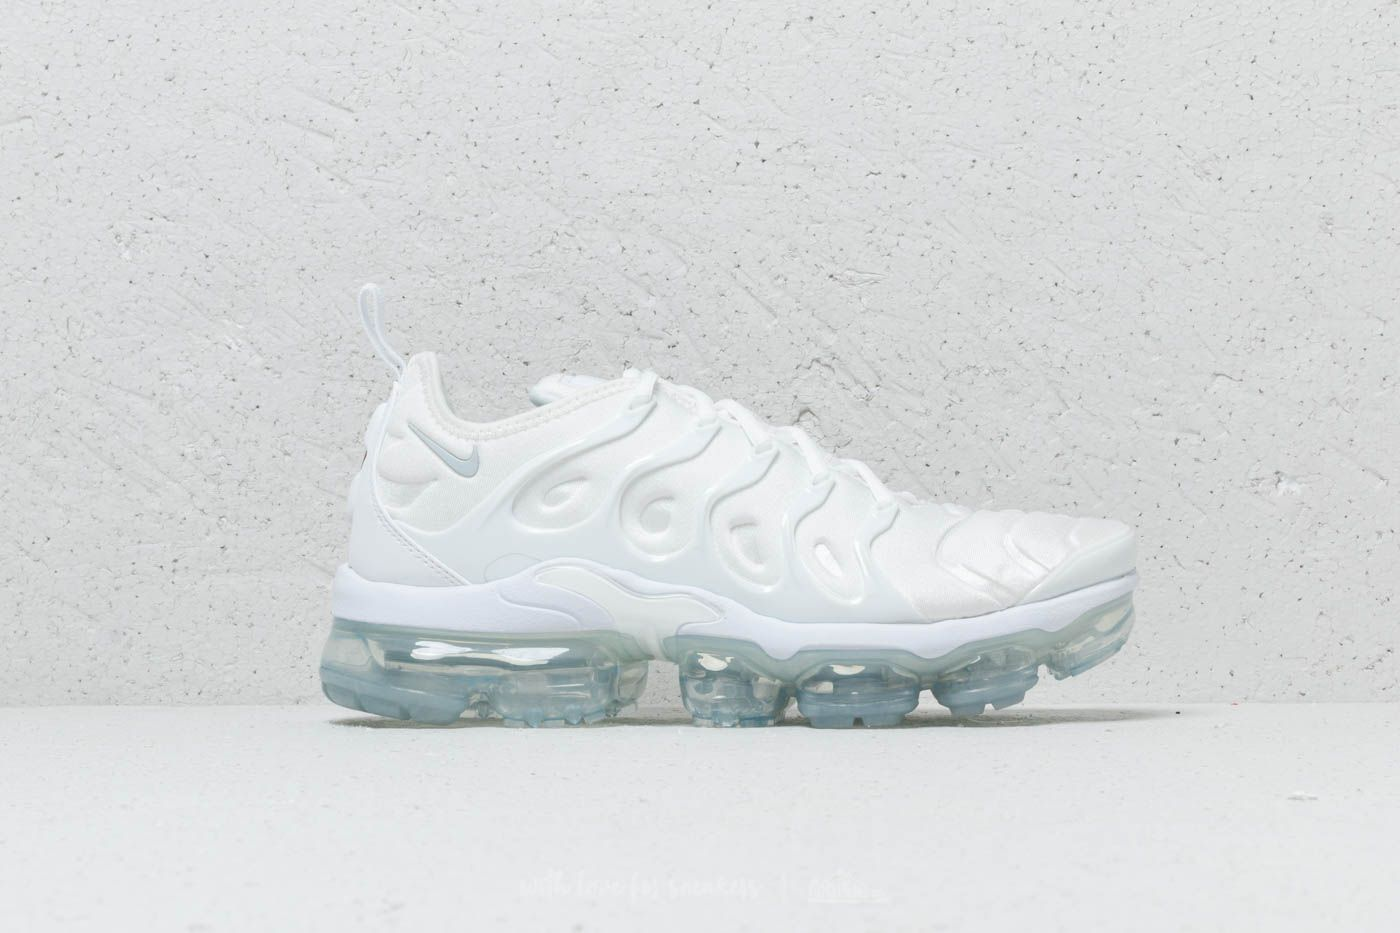 Nike Air Vapormax Plus White White Pure Platinum | Footshop